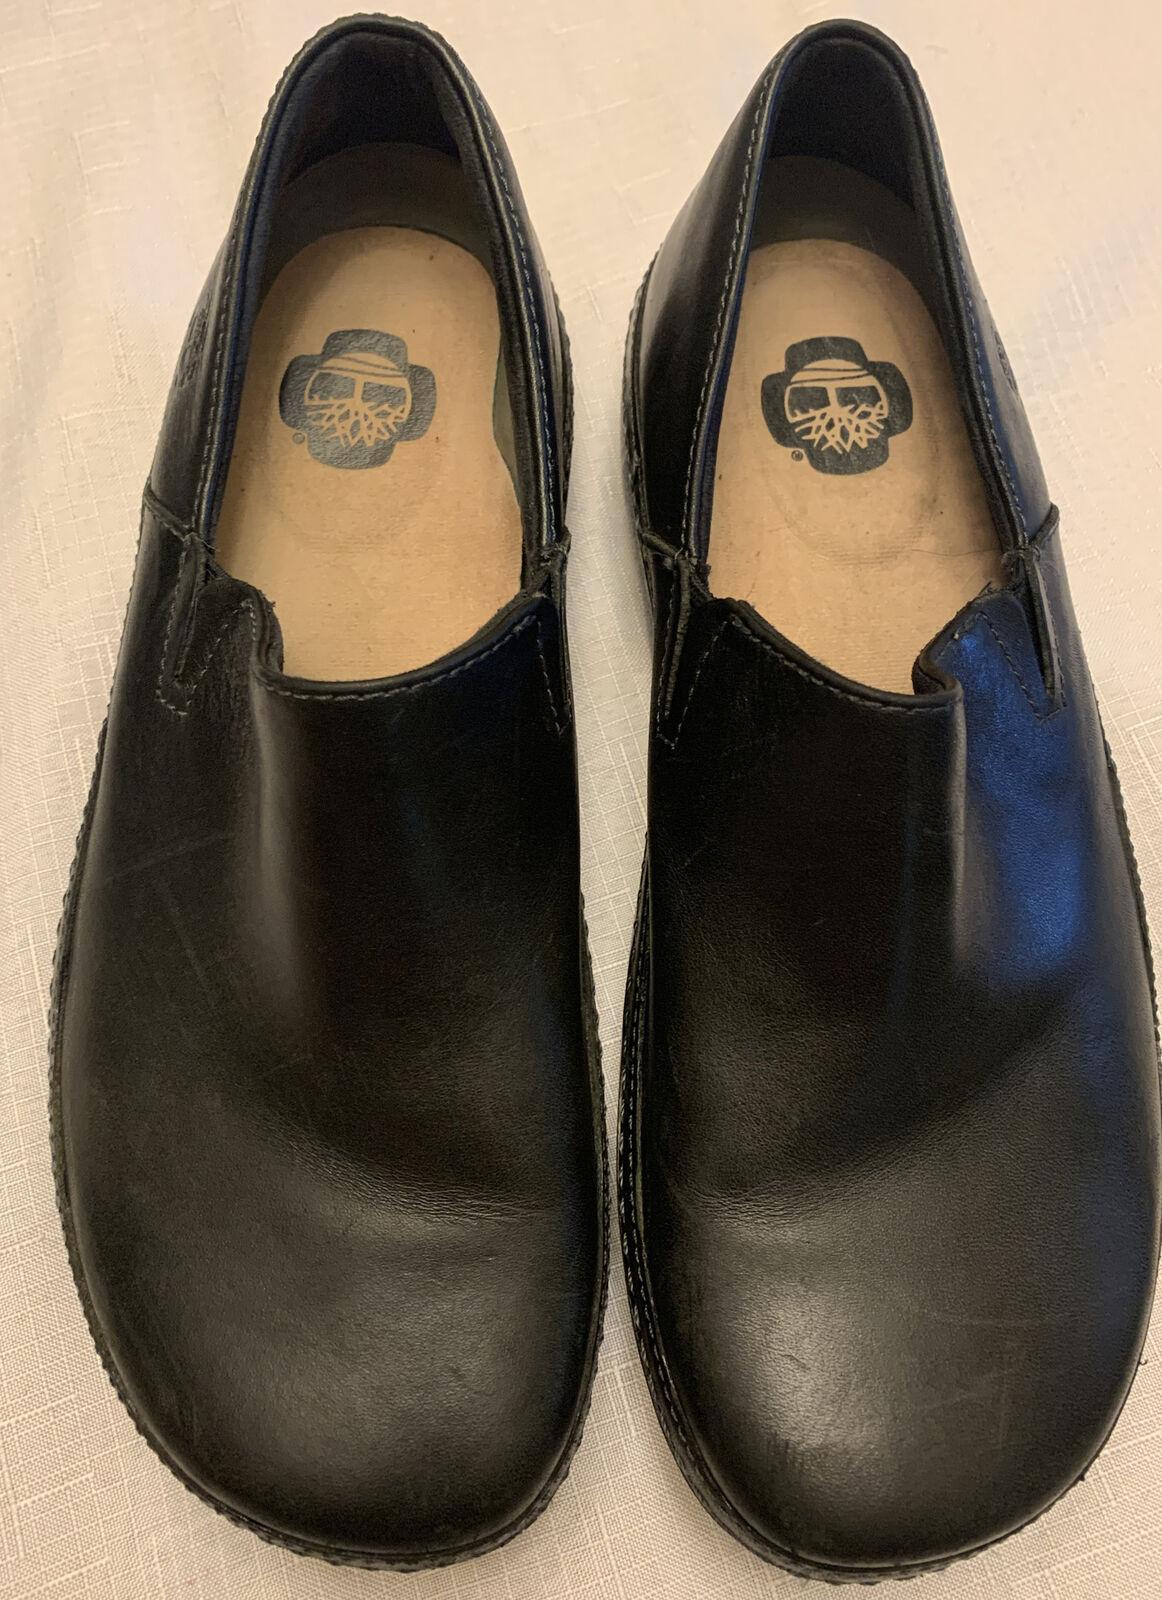 Timberland Black Slip On PRO153 Renova 89689B Slip Resistant Shoes Sz 8M - EXCEL